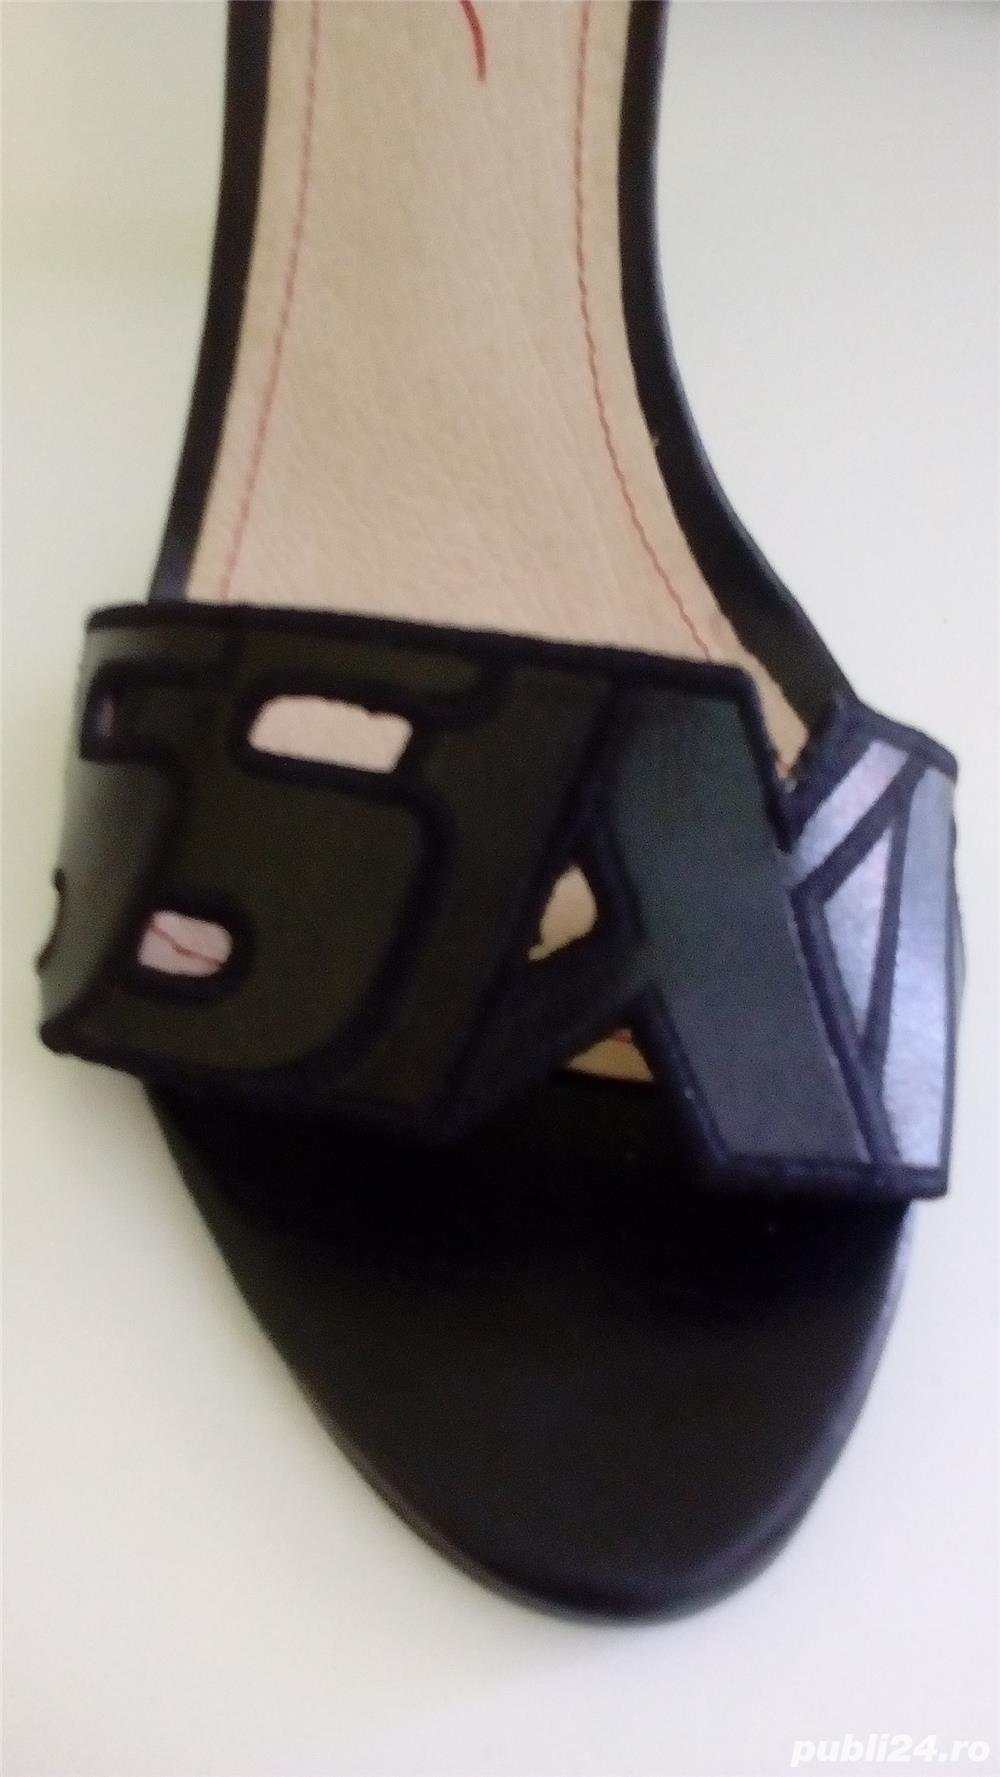 Sandale Miss Sixty noi cu eticheta 37